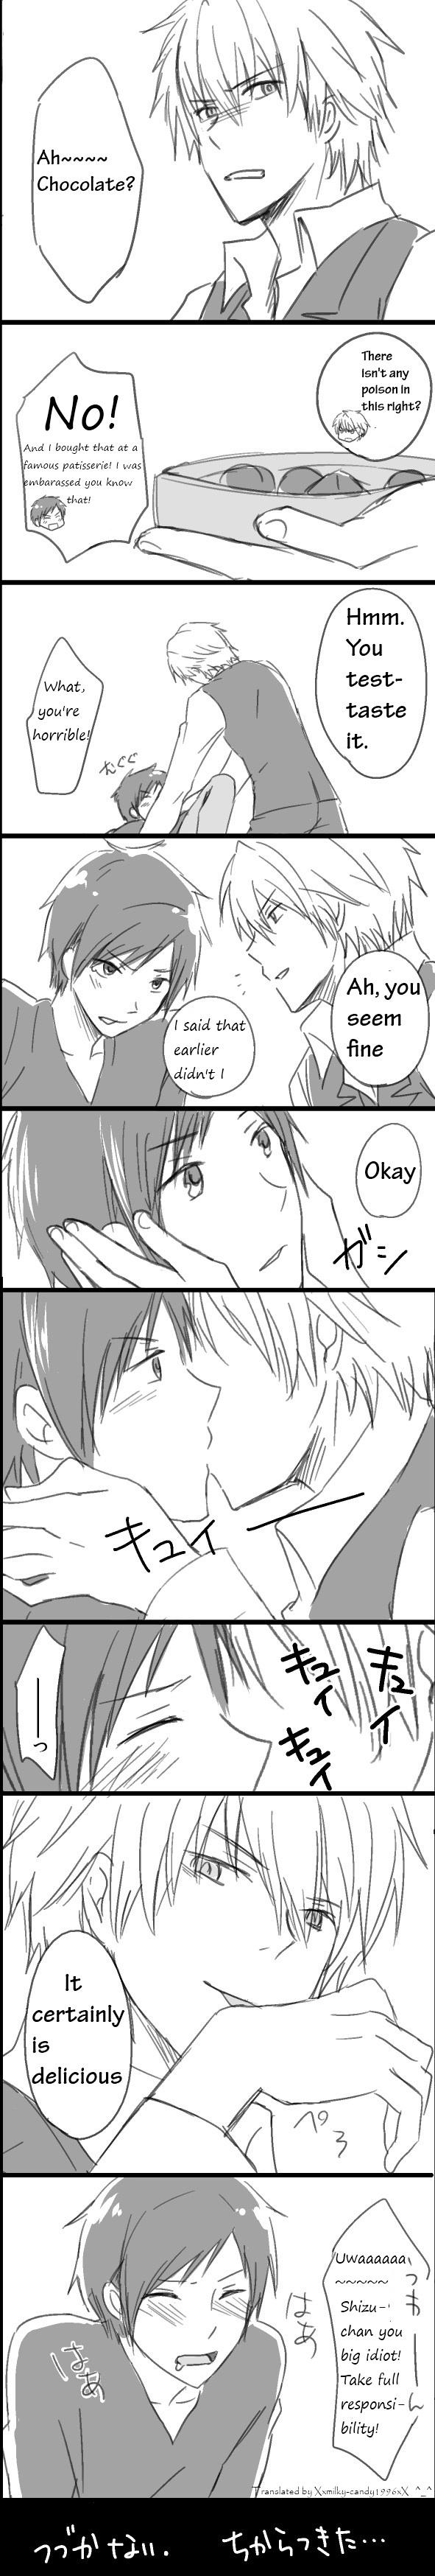 Tags: Anime, DURARARA!!, Heiwajima Shizuo, Orihara Izaya, Translated, Comic, Shizaya